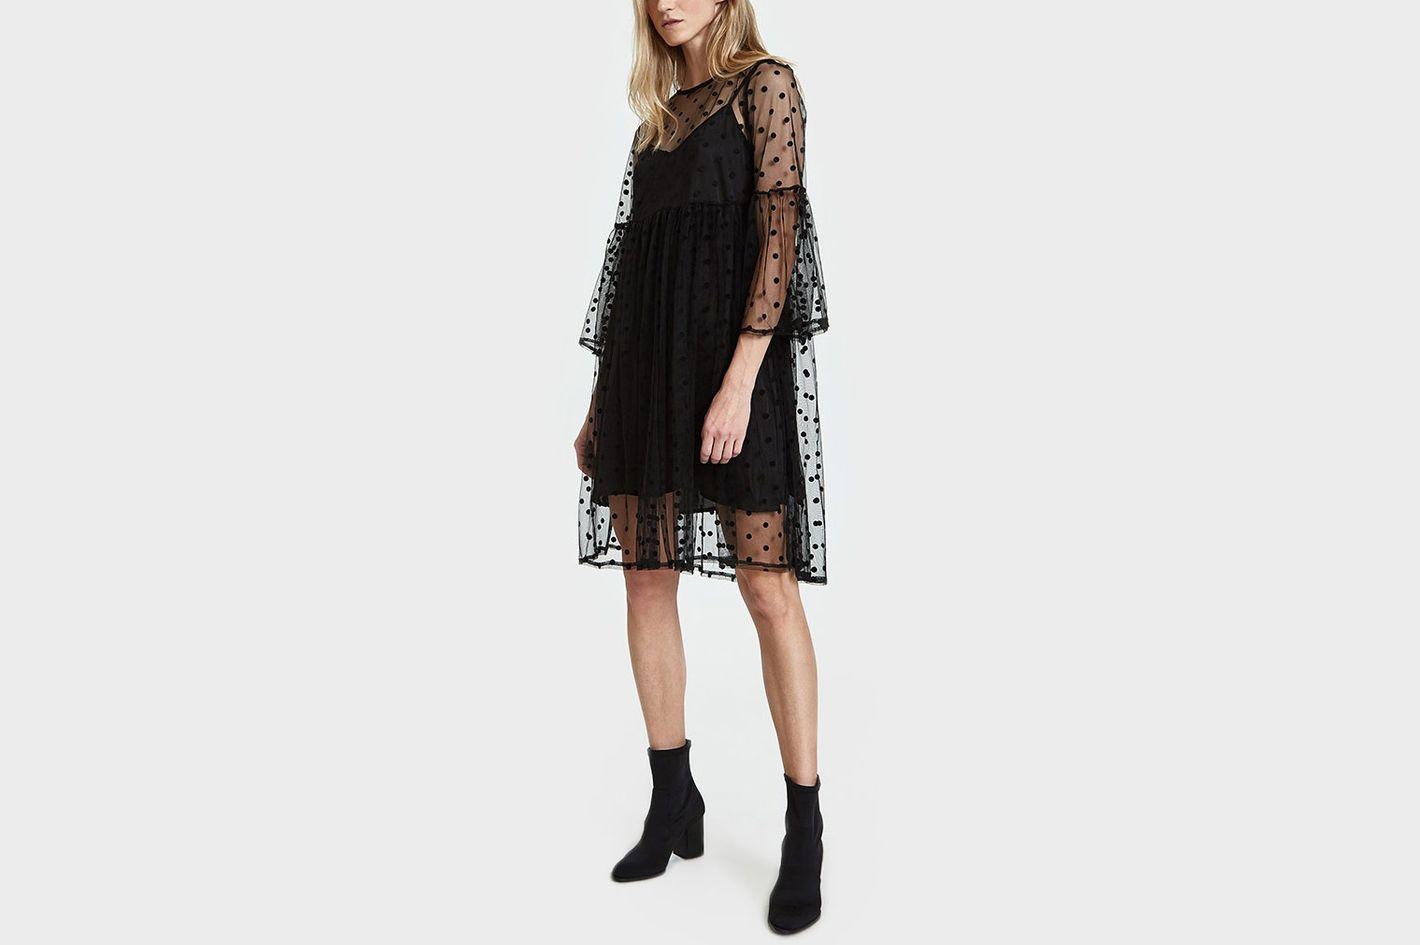 Farrow Luisana Dress